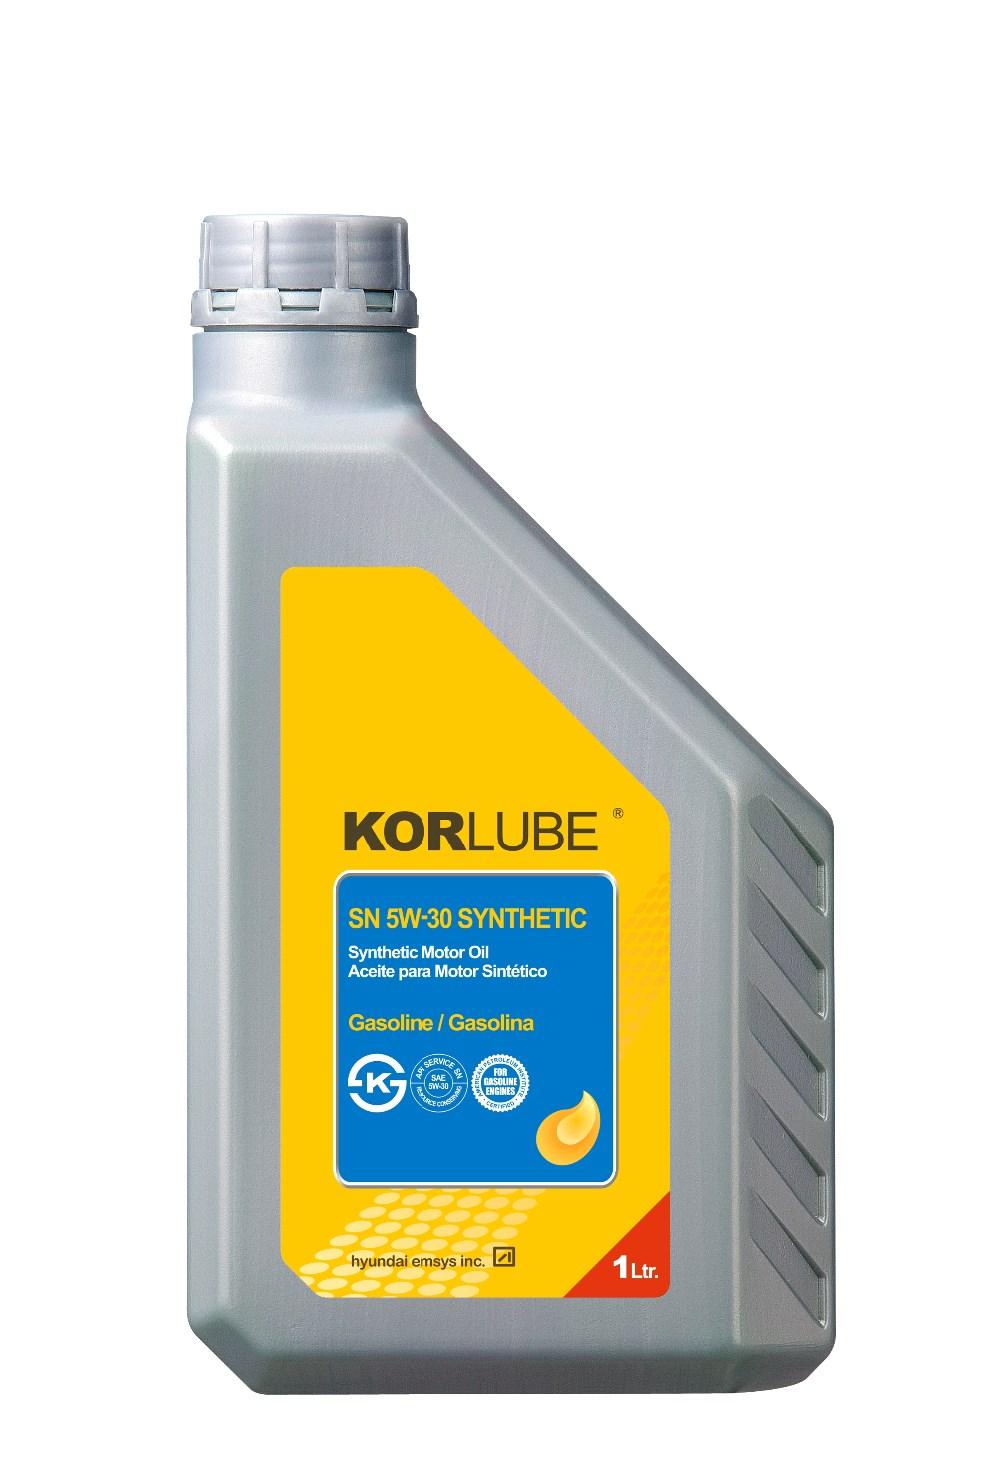 Korea Oil Pump Co Ltd Email Mail